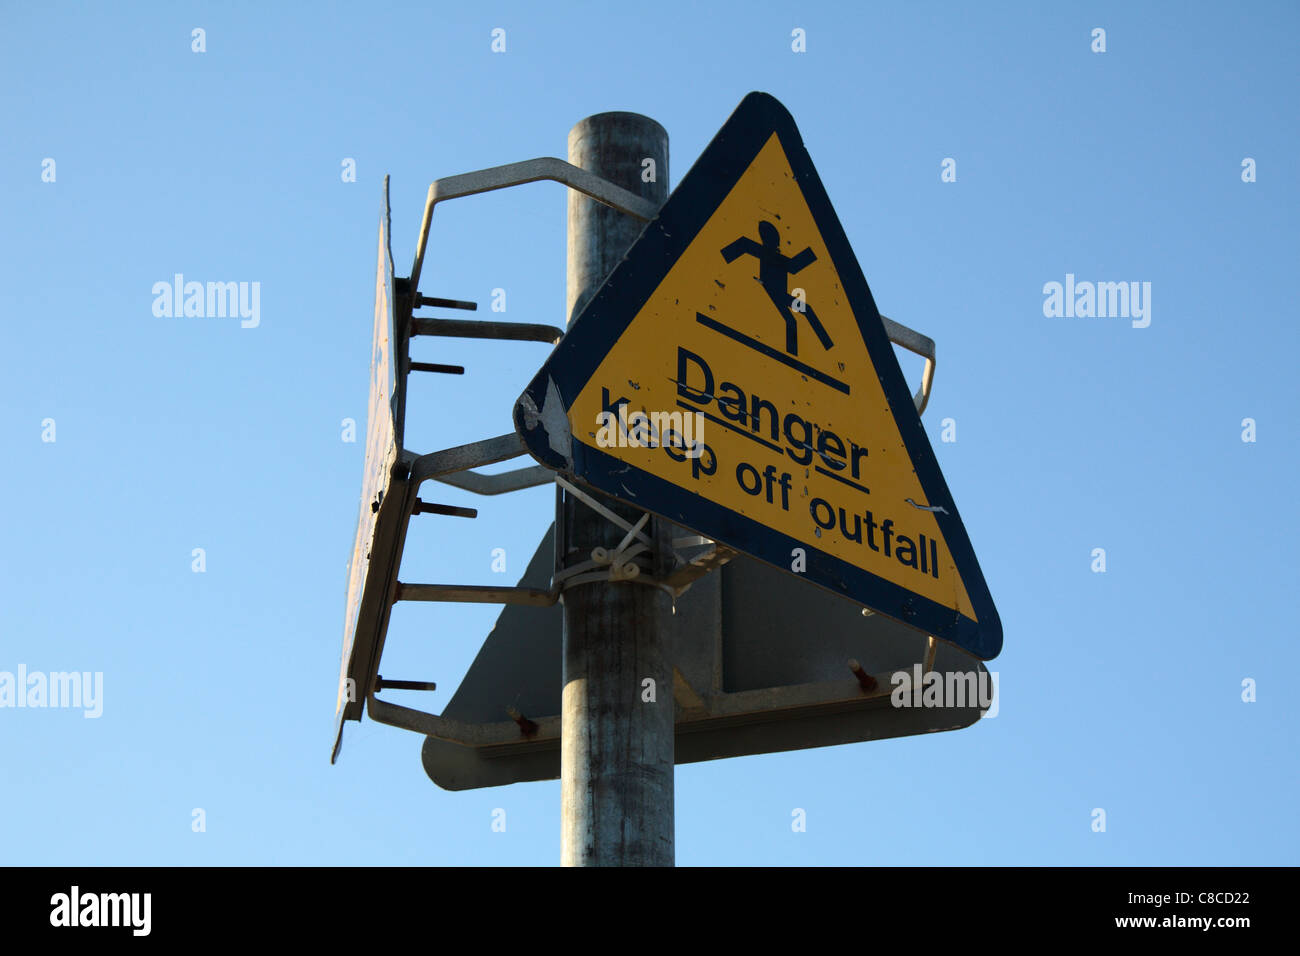 Danger sign at Ryde beach - Stock Image